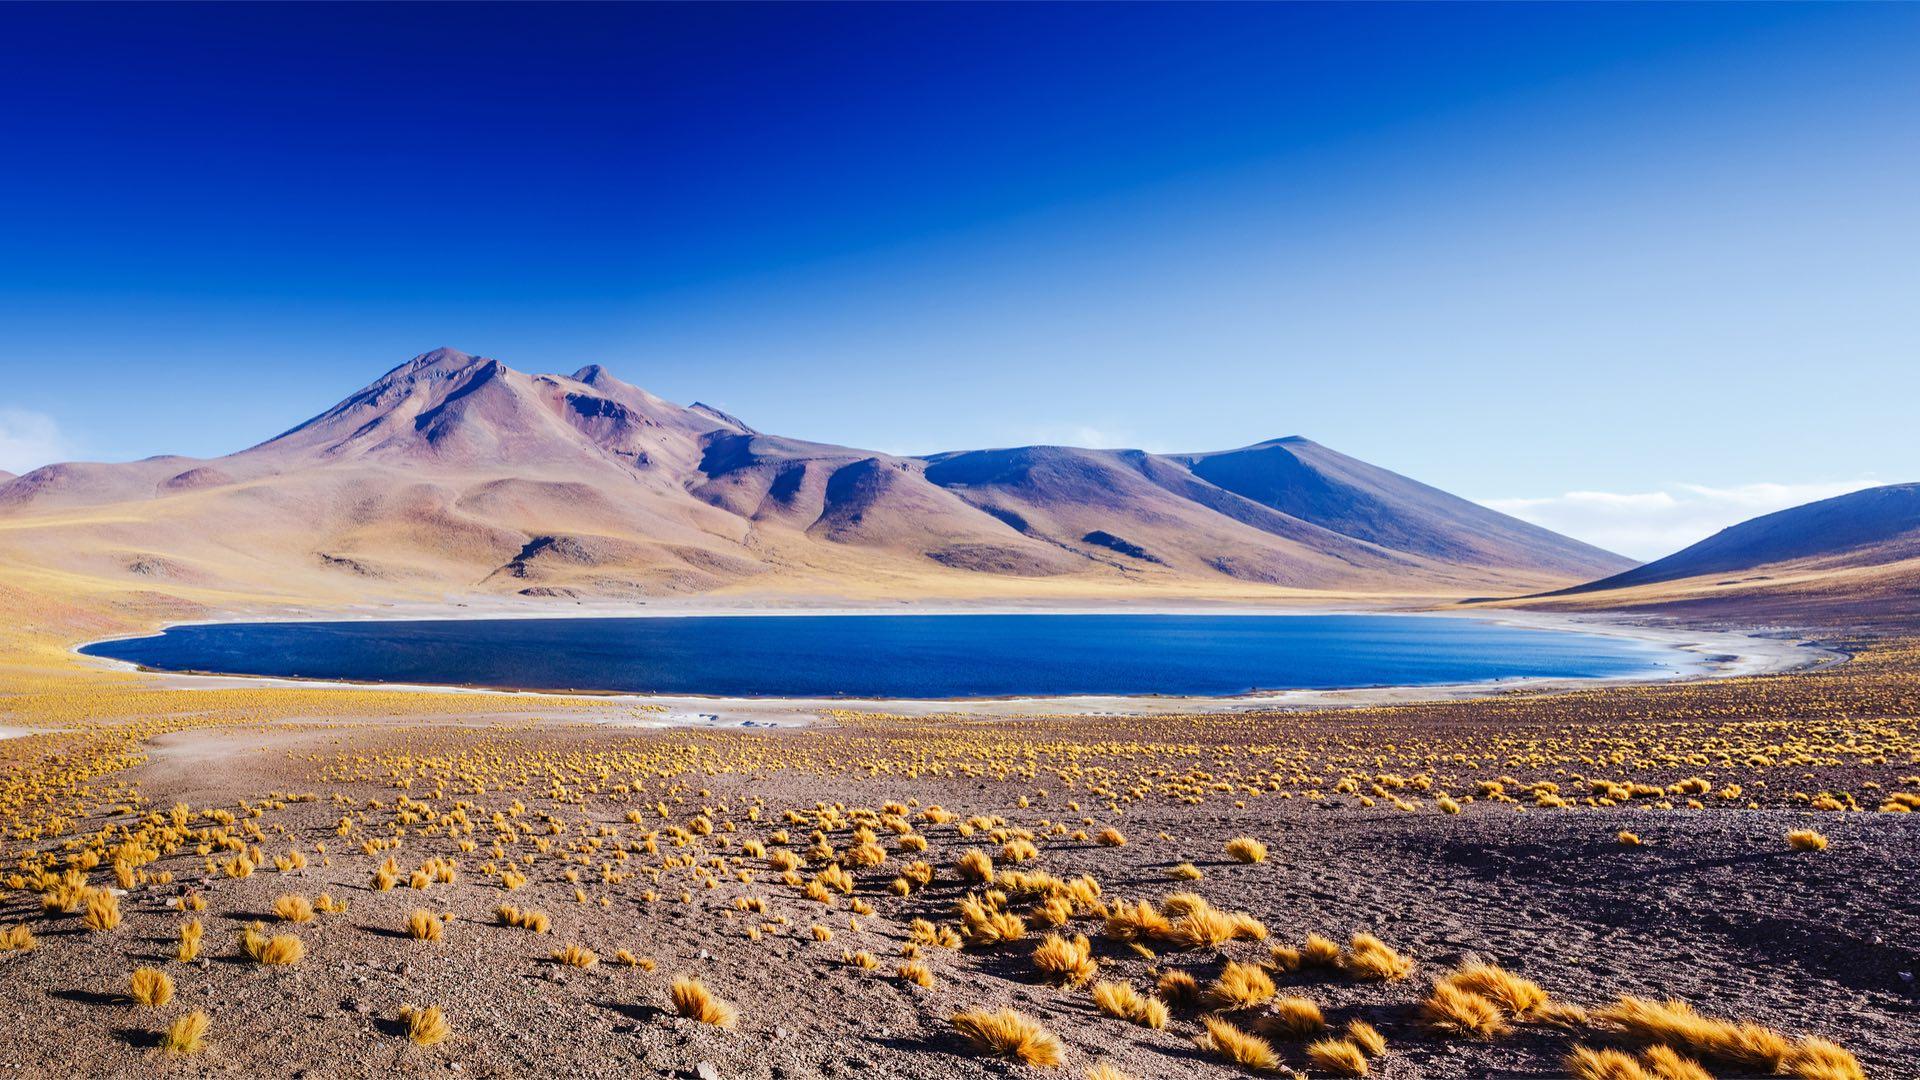 Chile | Hochland | ©Olga Danylenko/Shutterstock.com